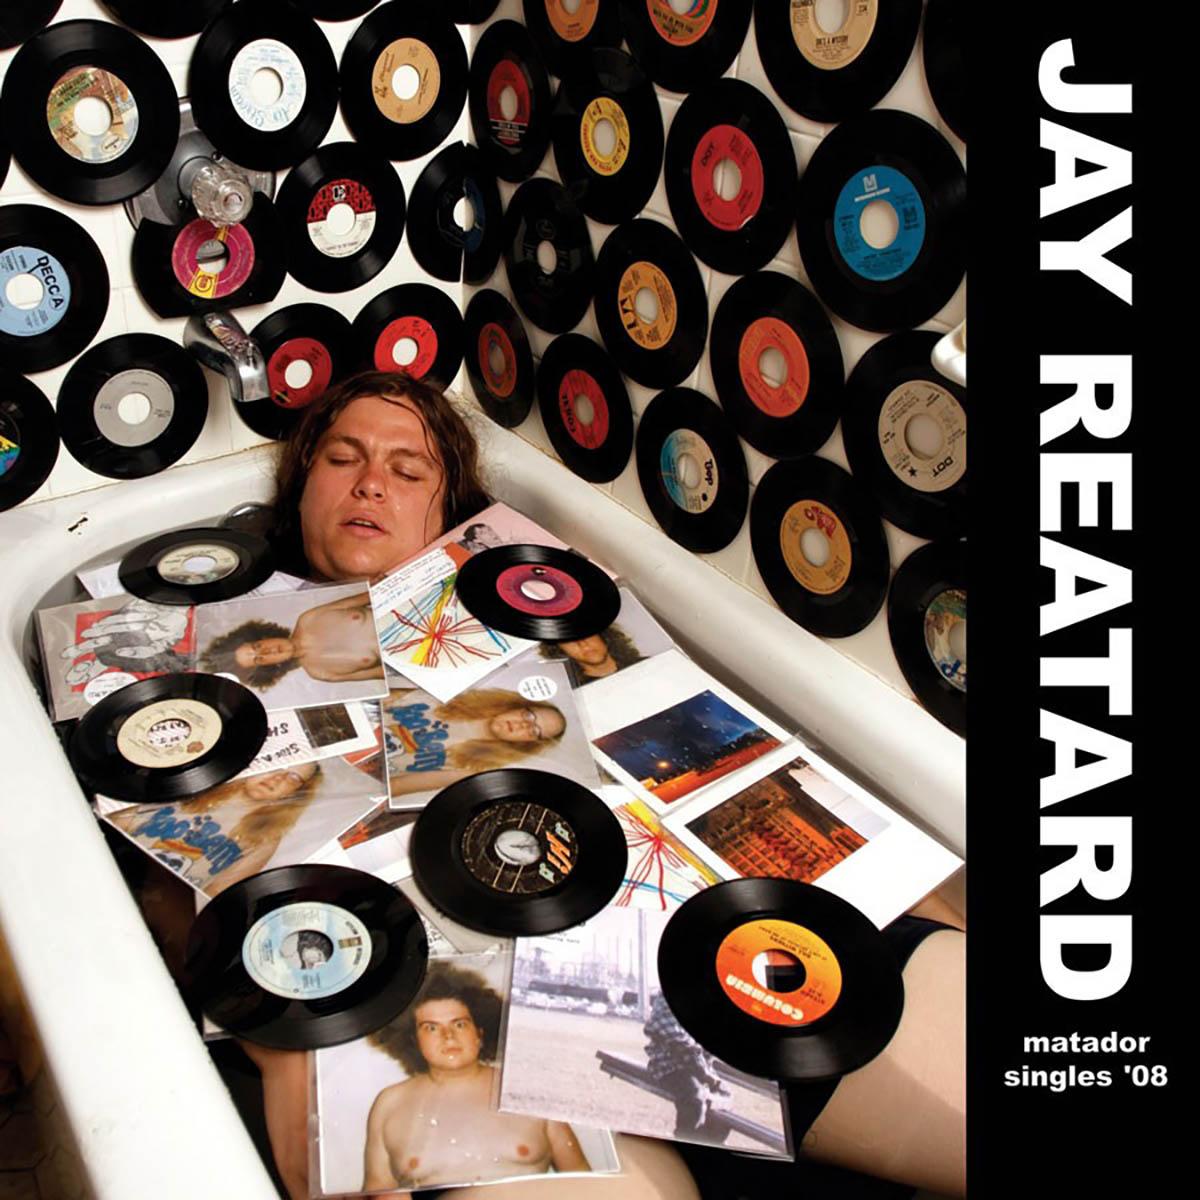 Jay Reatard, Matador Singles '08